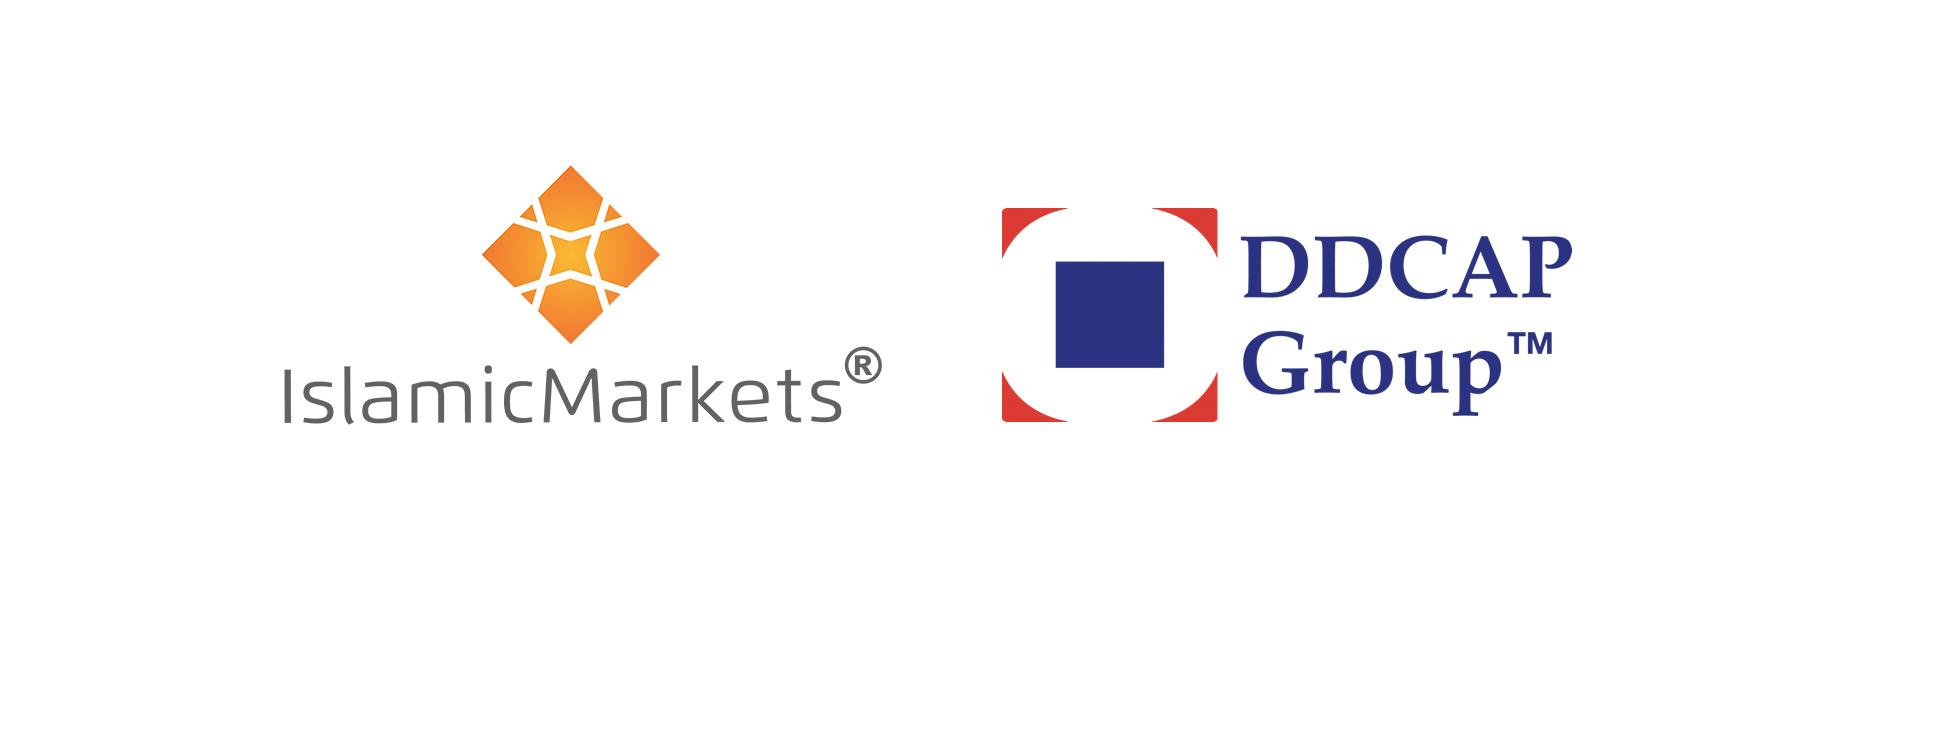 IslamicMarkets.com closes strategic funding round with DDCAP